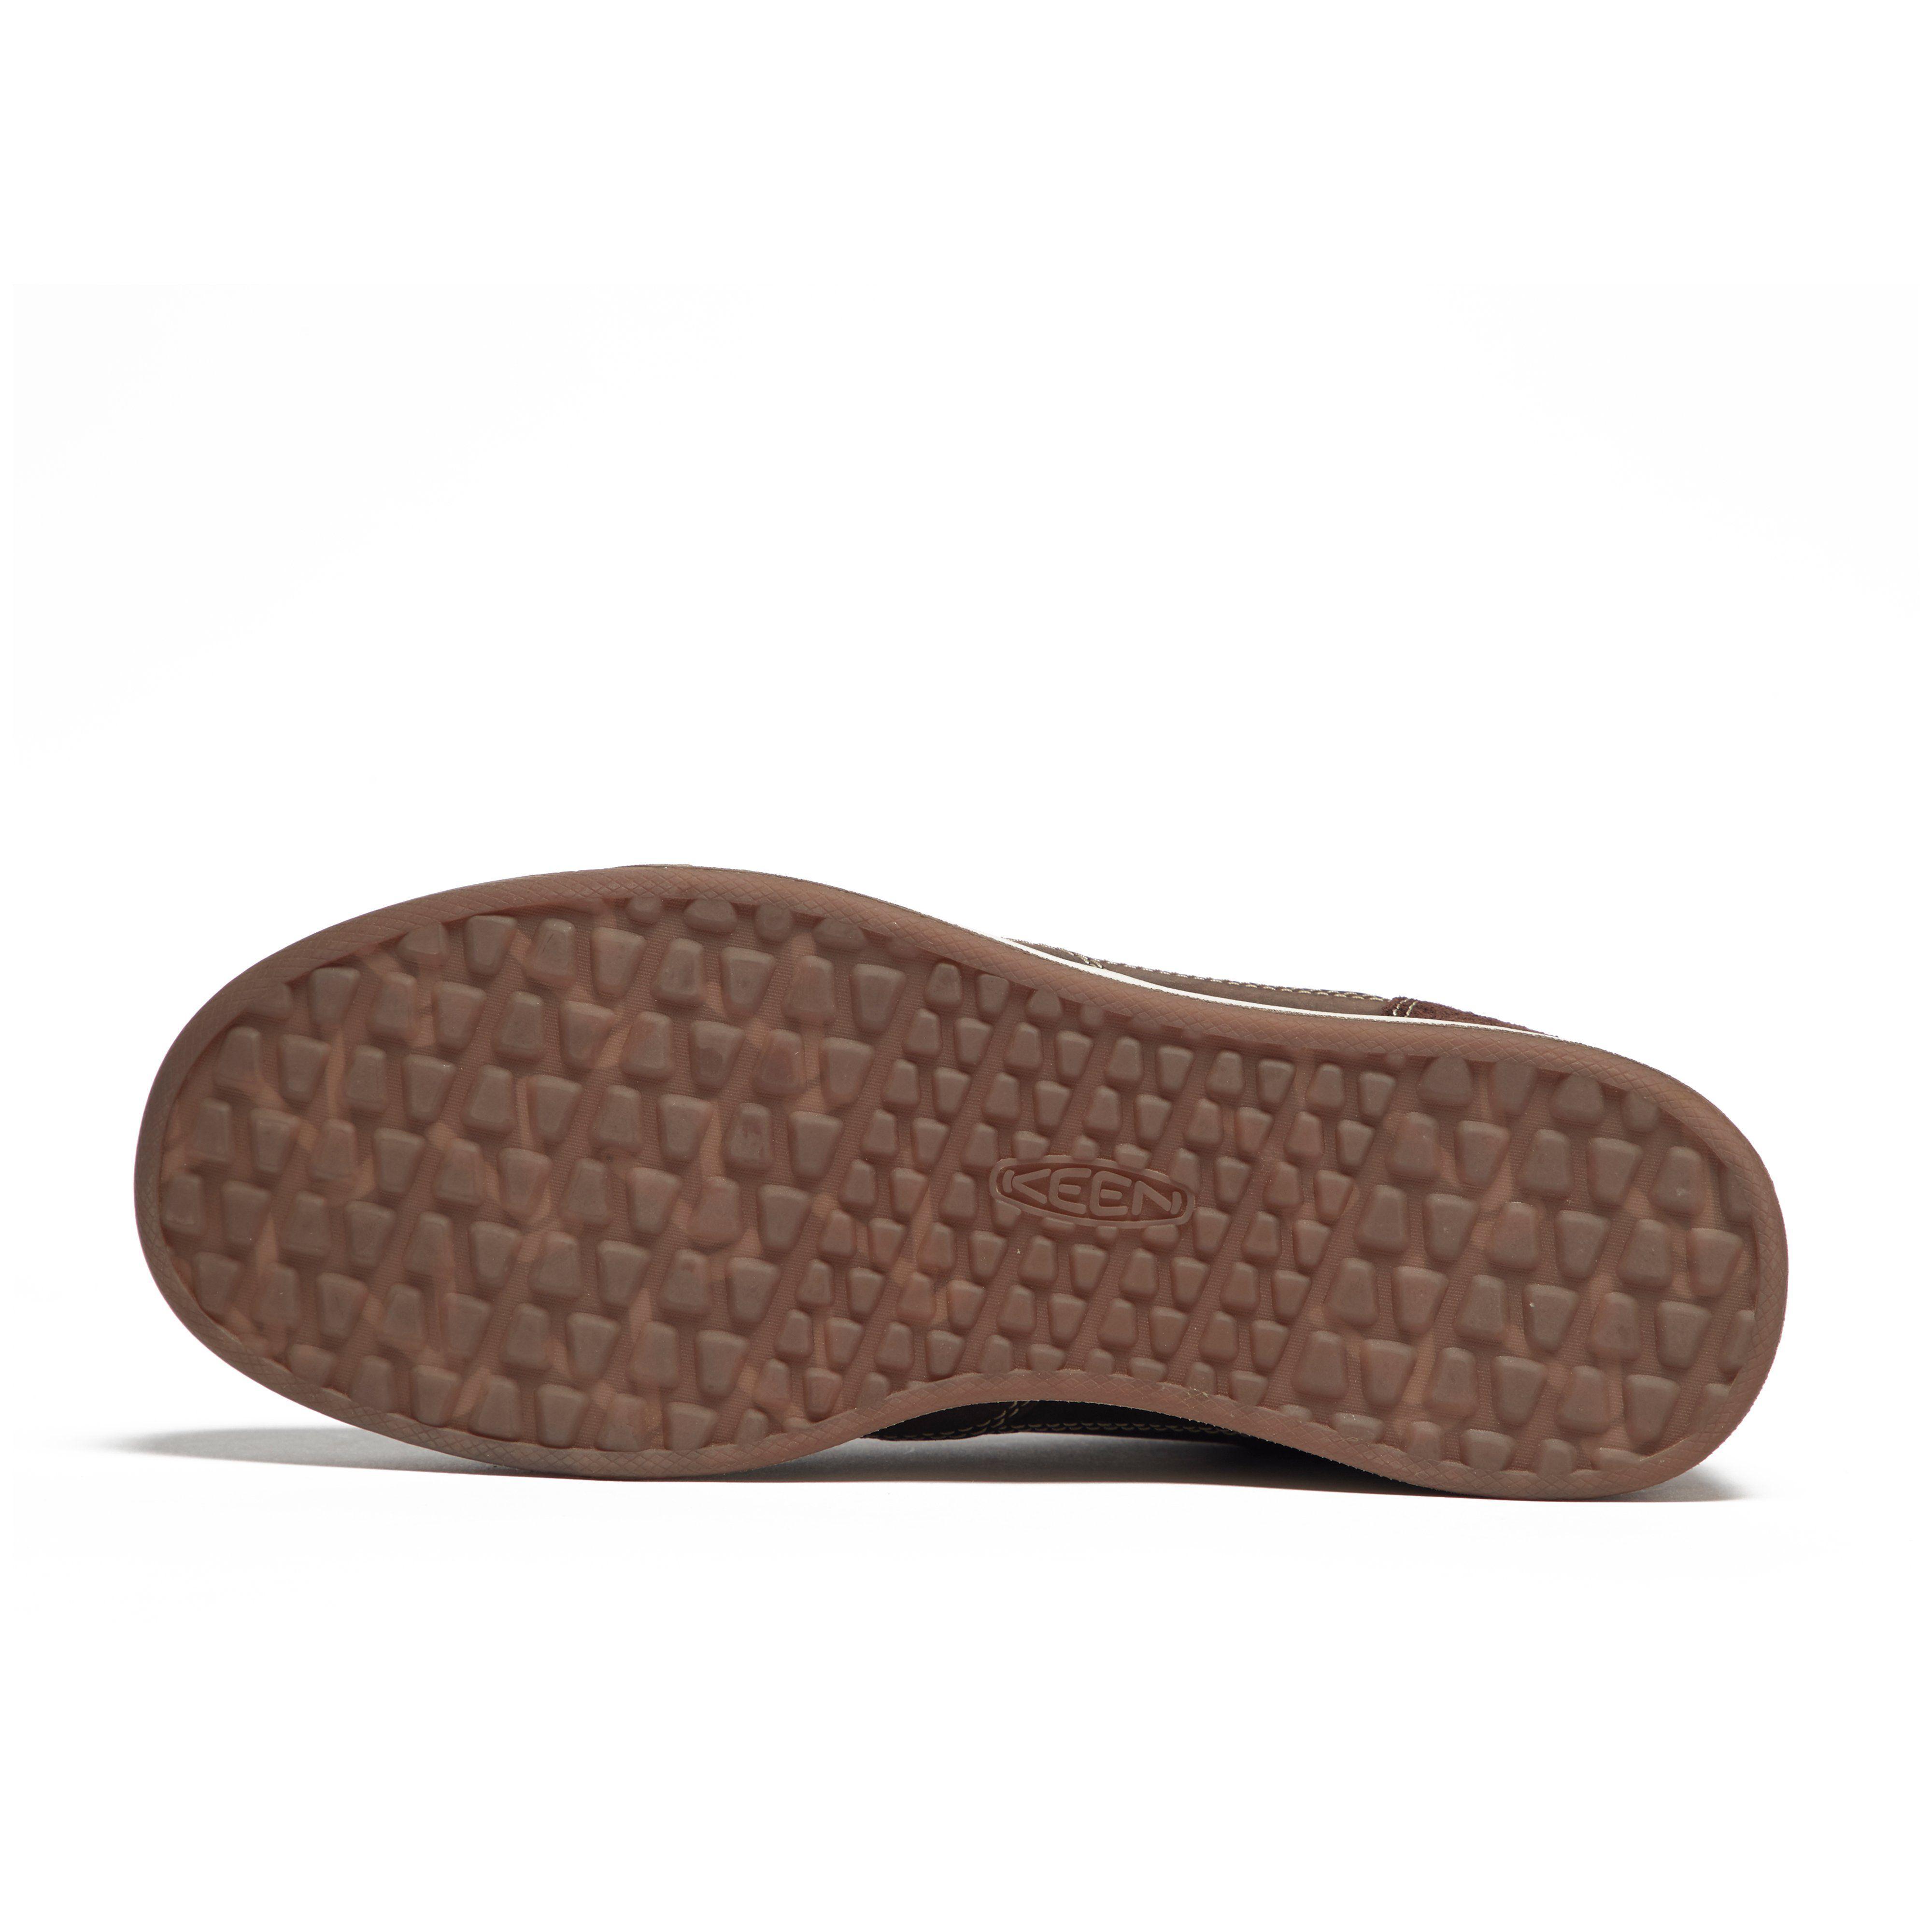 Keen Ghaven Men's Walking Shoes